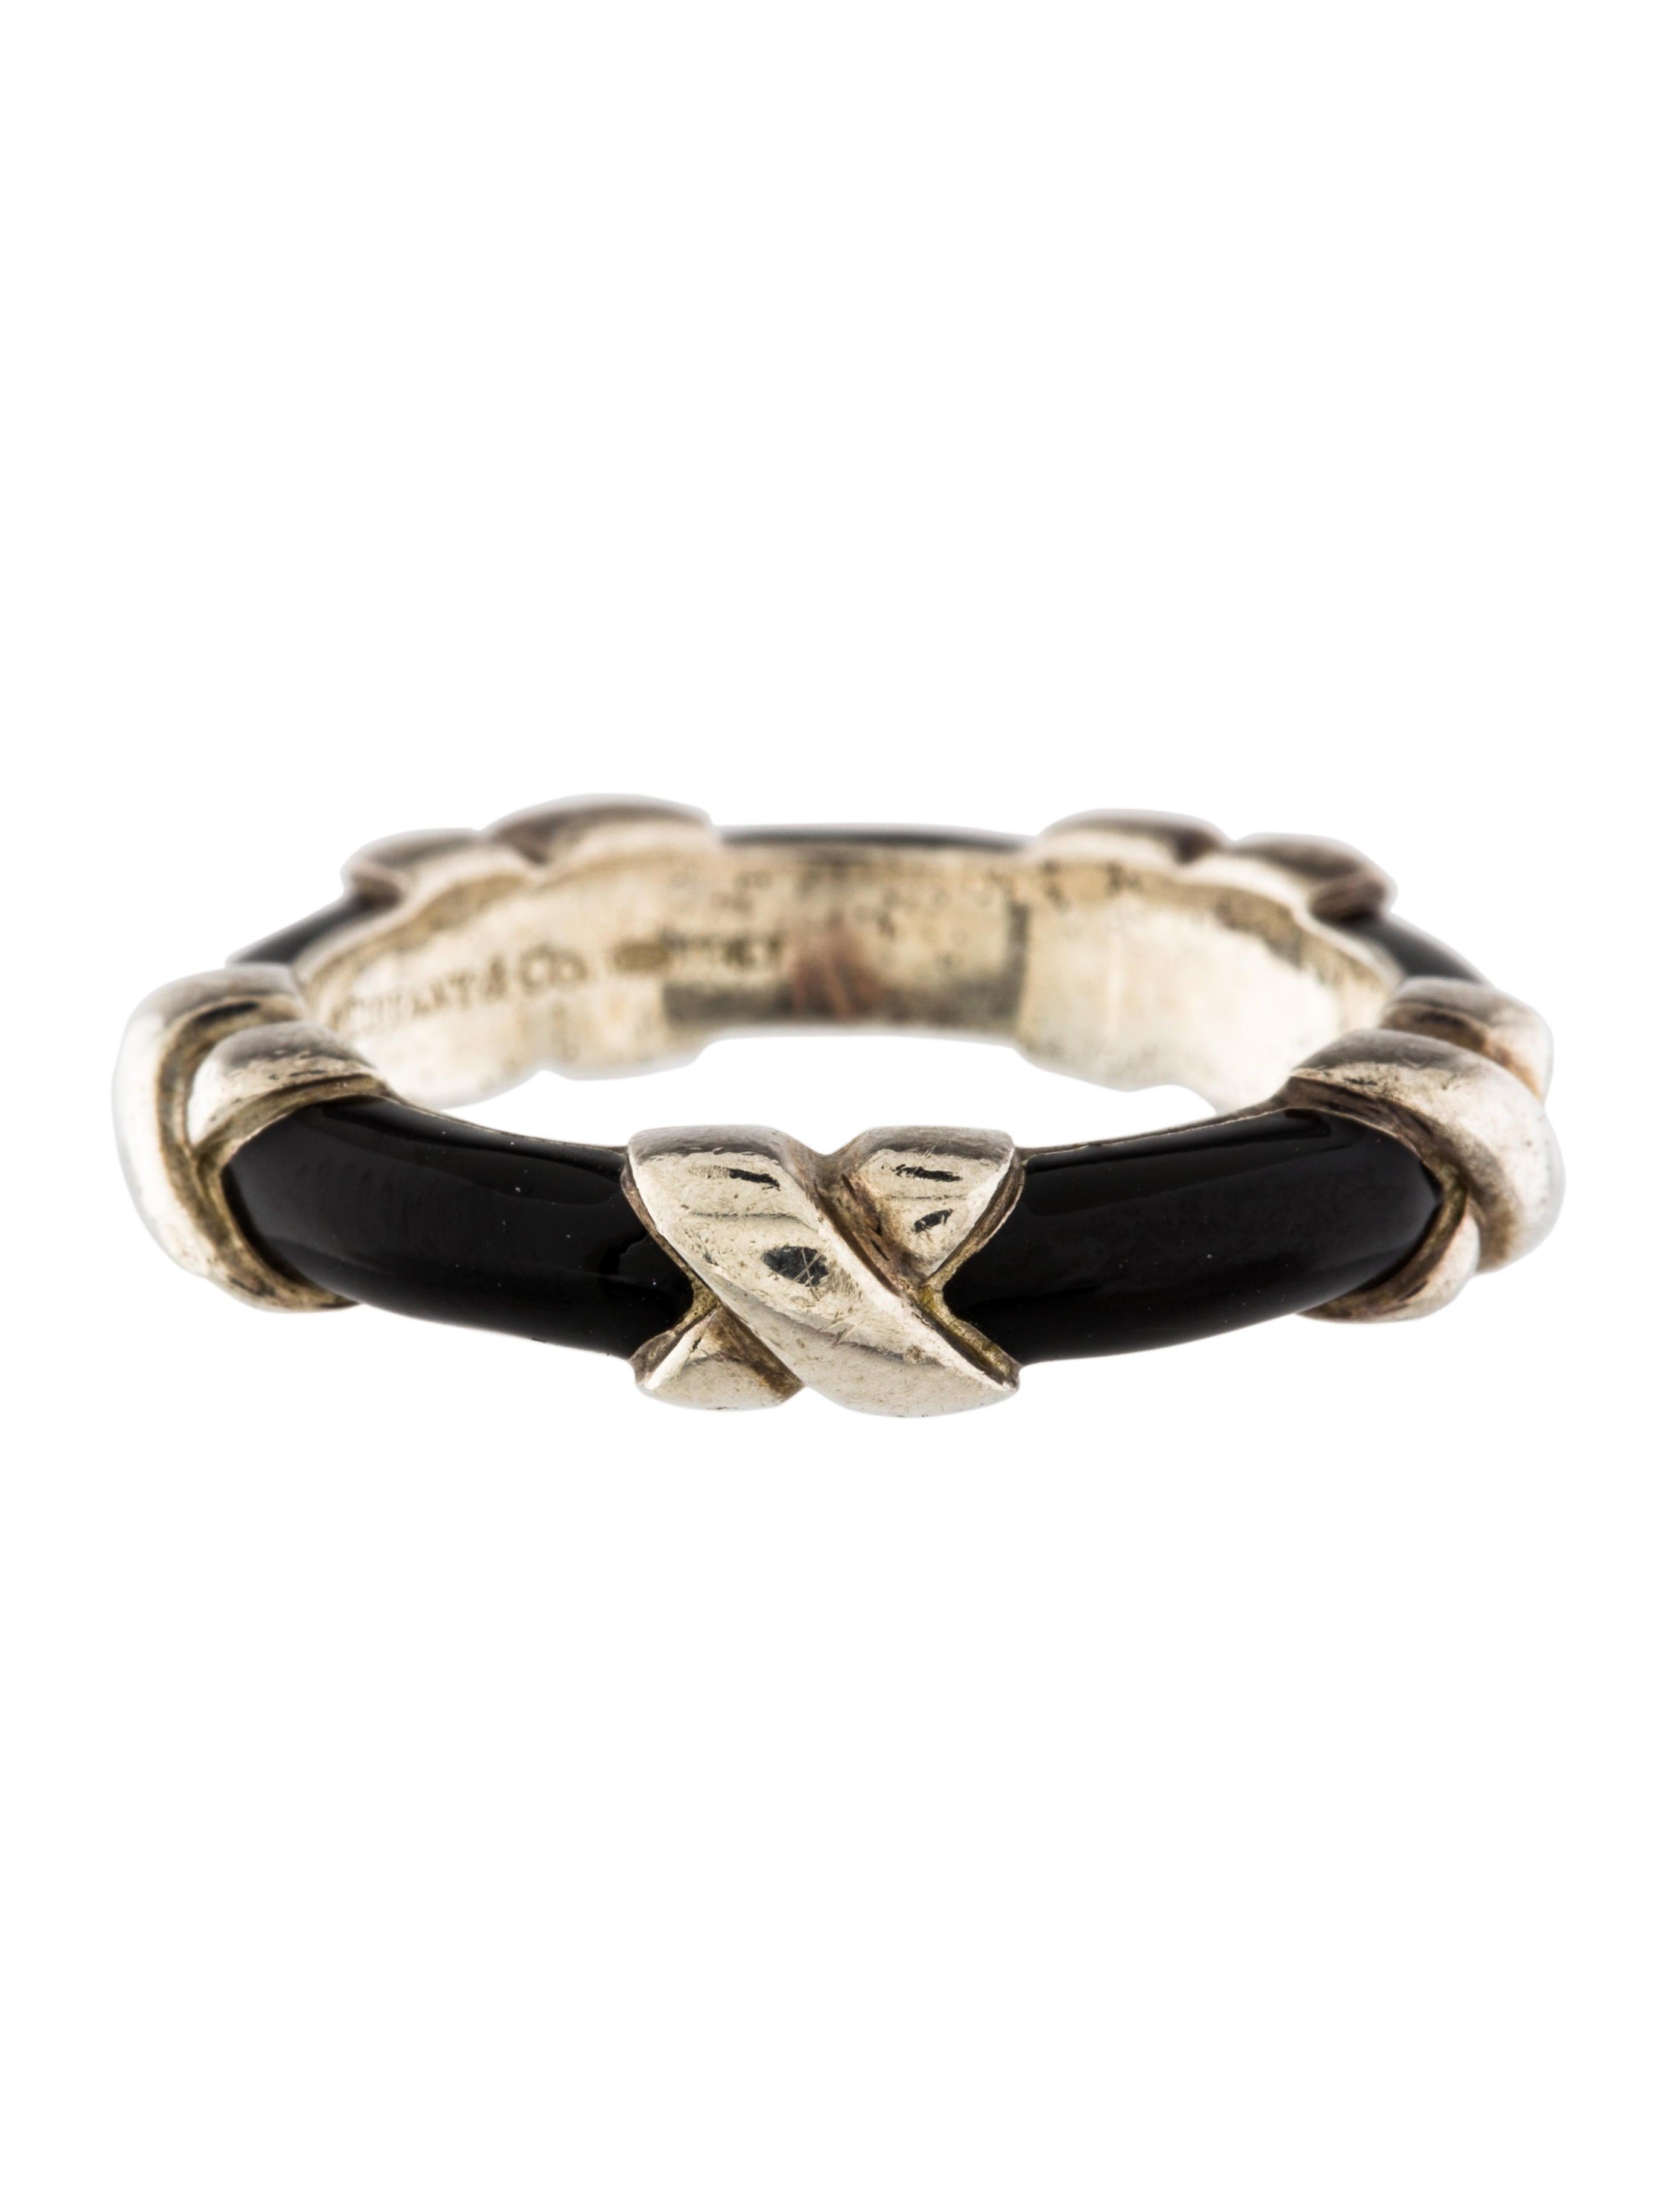 Tiffany Amp Co Enamel X Band Ring Rings Tif56629 The